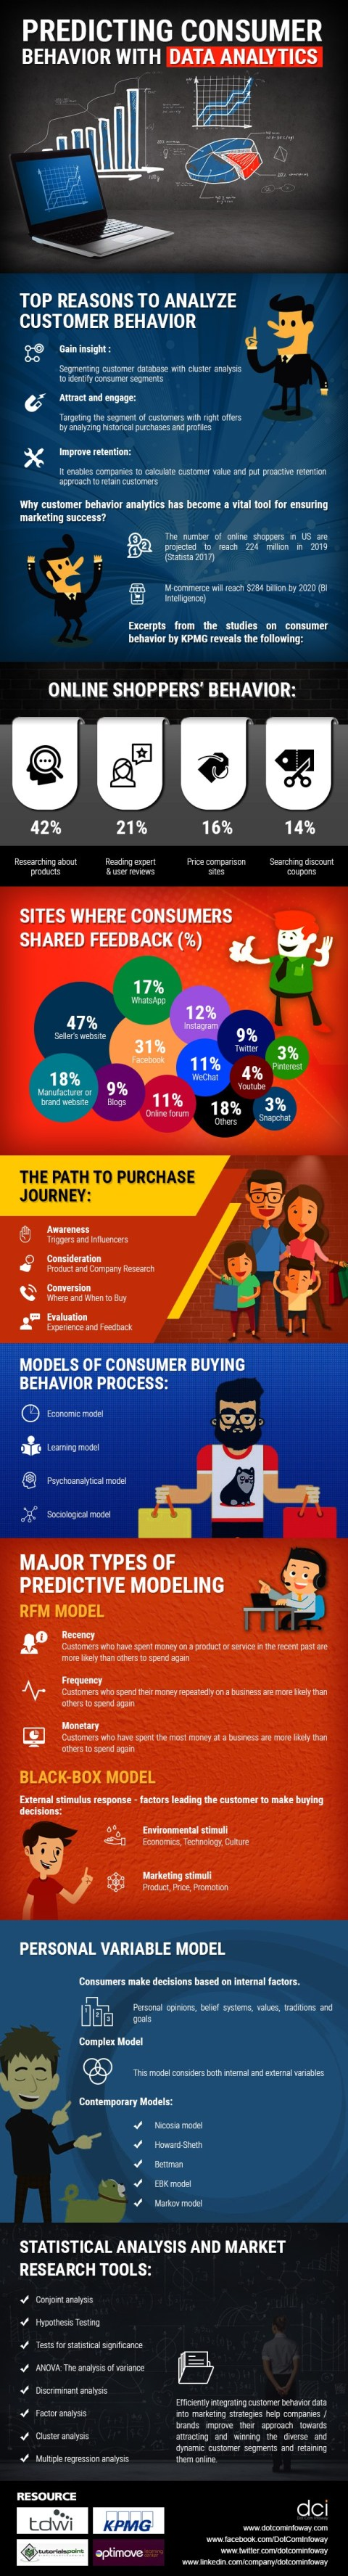 Data Analytics Can Help Predict Consumer Behavior